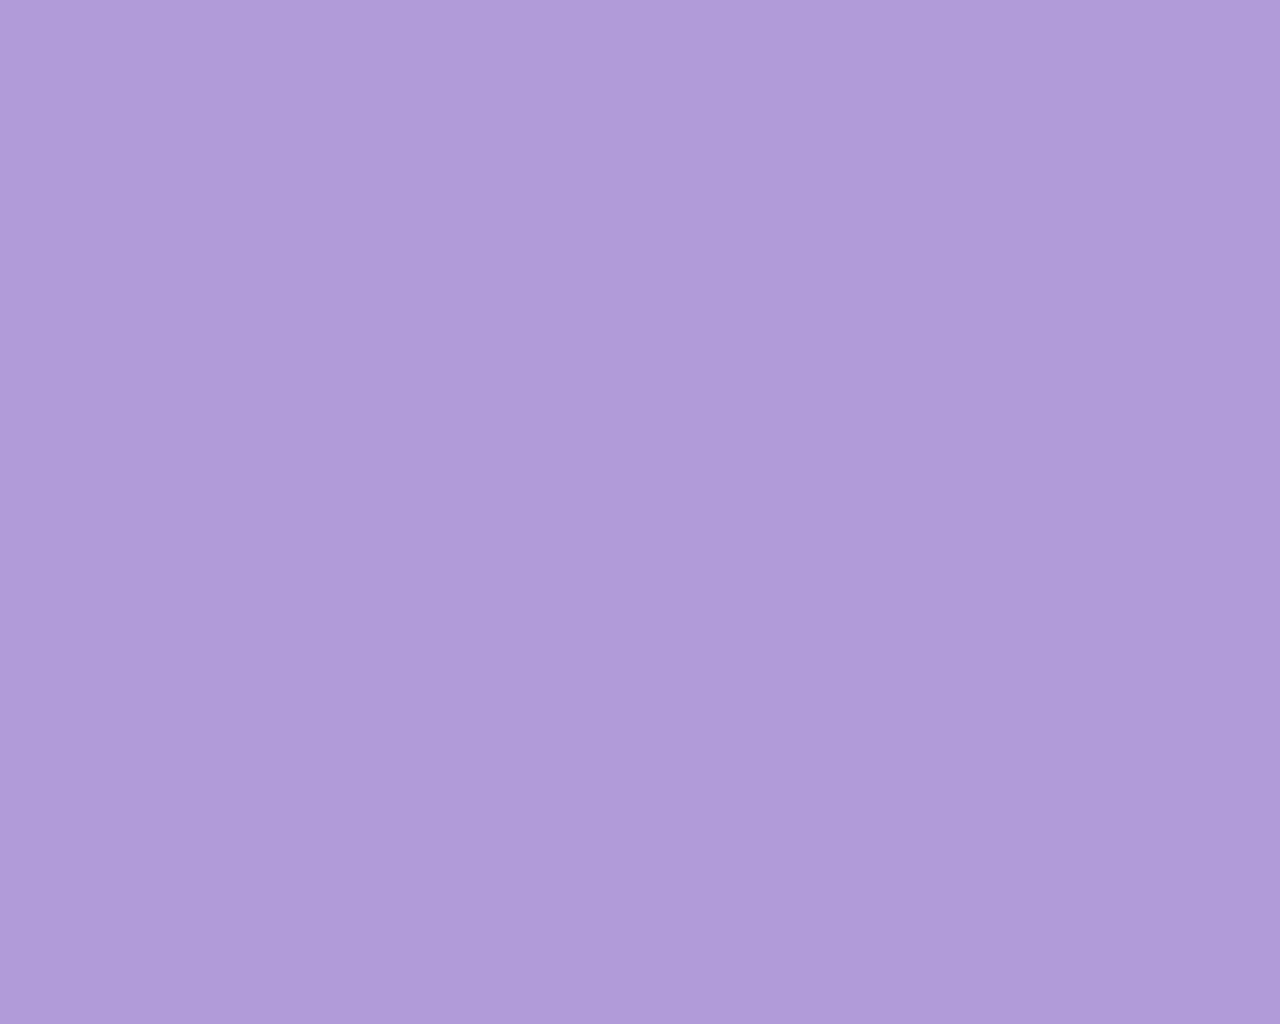 1280x1024 Light Pastel Purple Solid Color Background